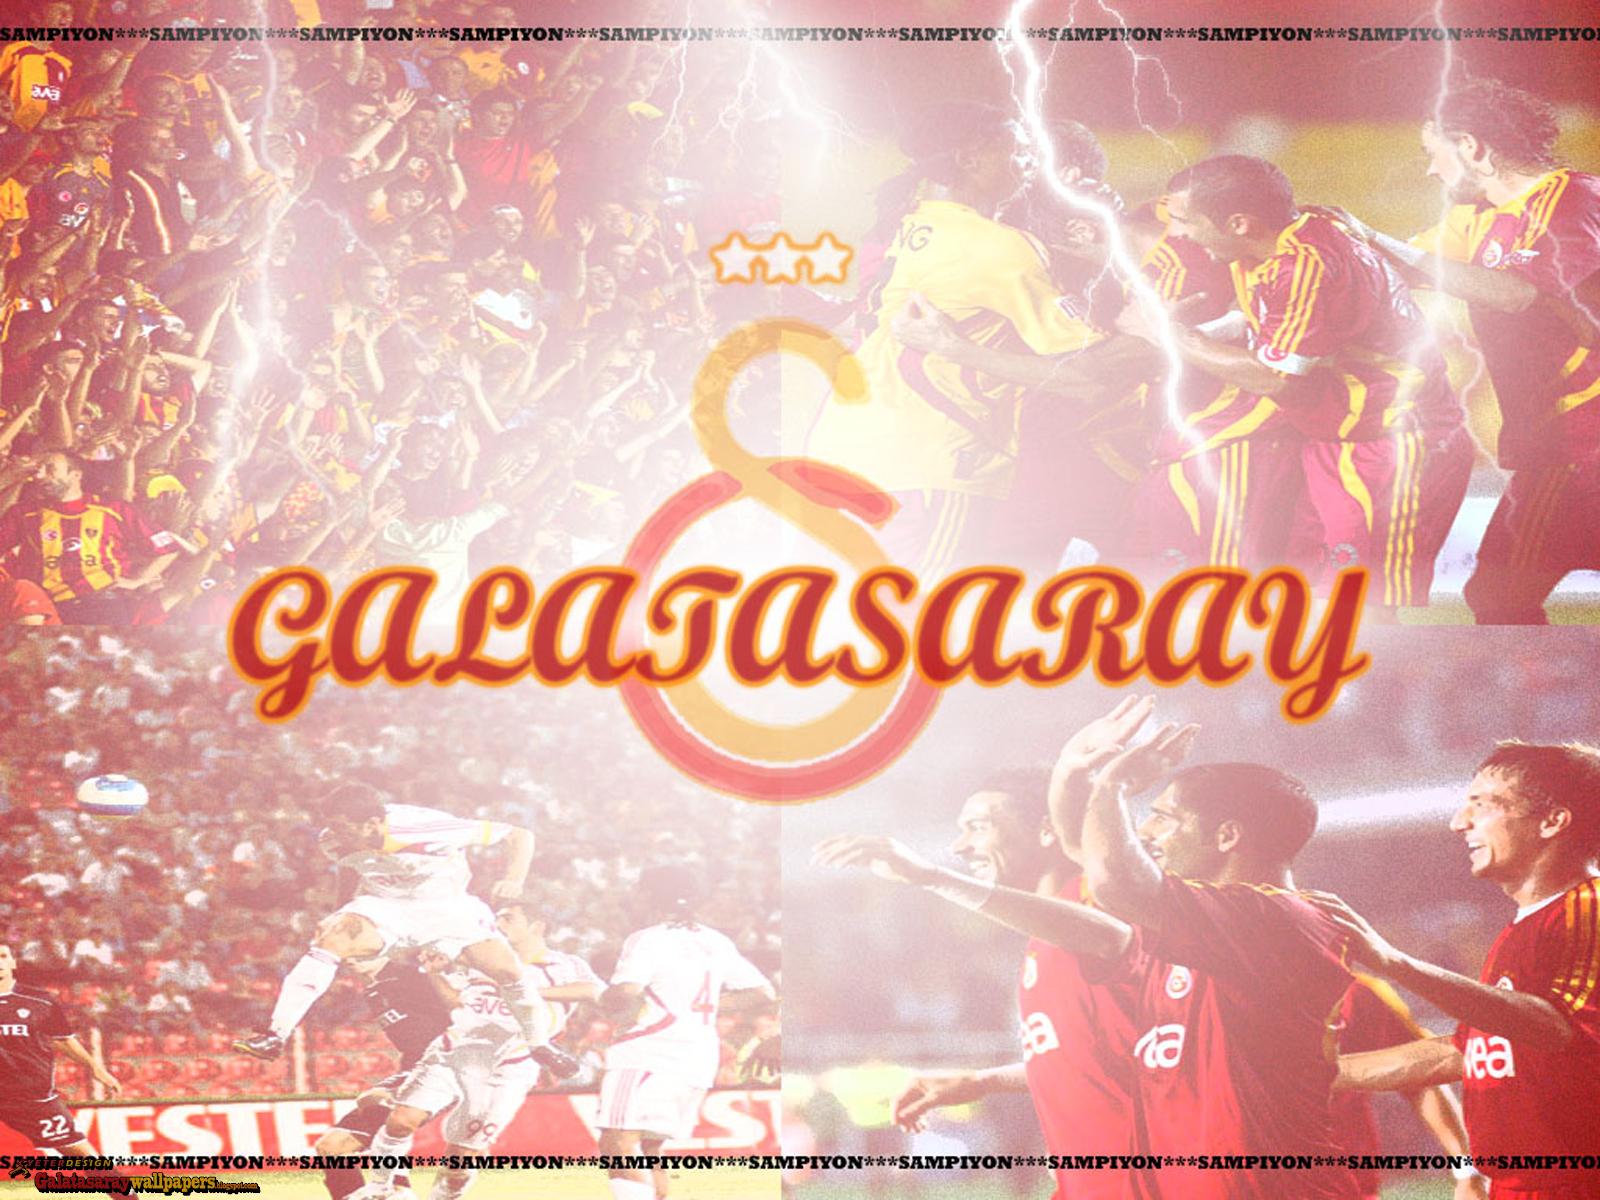 https://3.bp.blogspot.com/_1_qHrQBPgHE/TMTzTg1ypEI/AAAAAAAABIc/Q9eu6xrglhA/s1600/Galatasaray+2007-2008+-+Sampiyon+GW+2.jpg